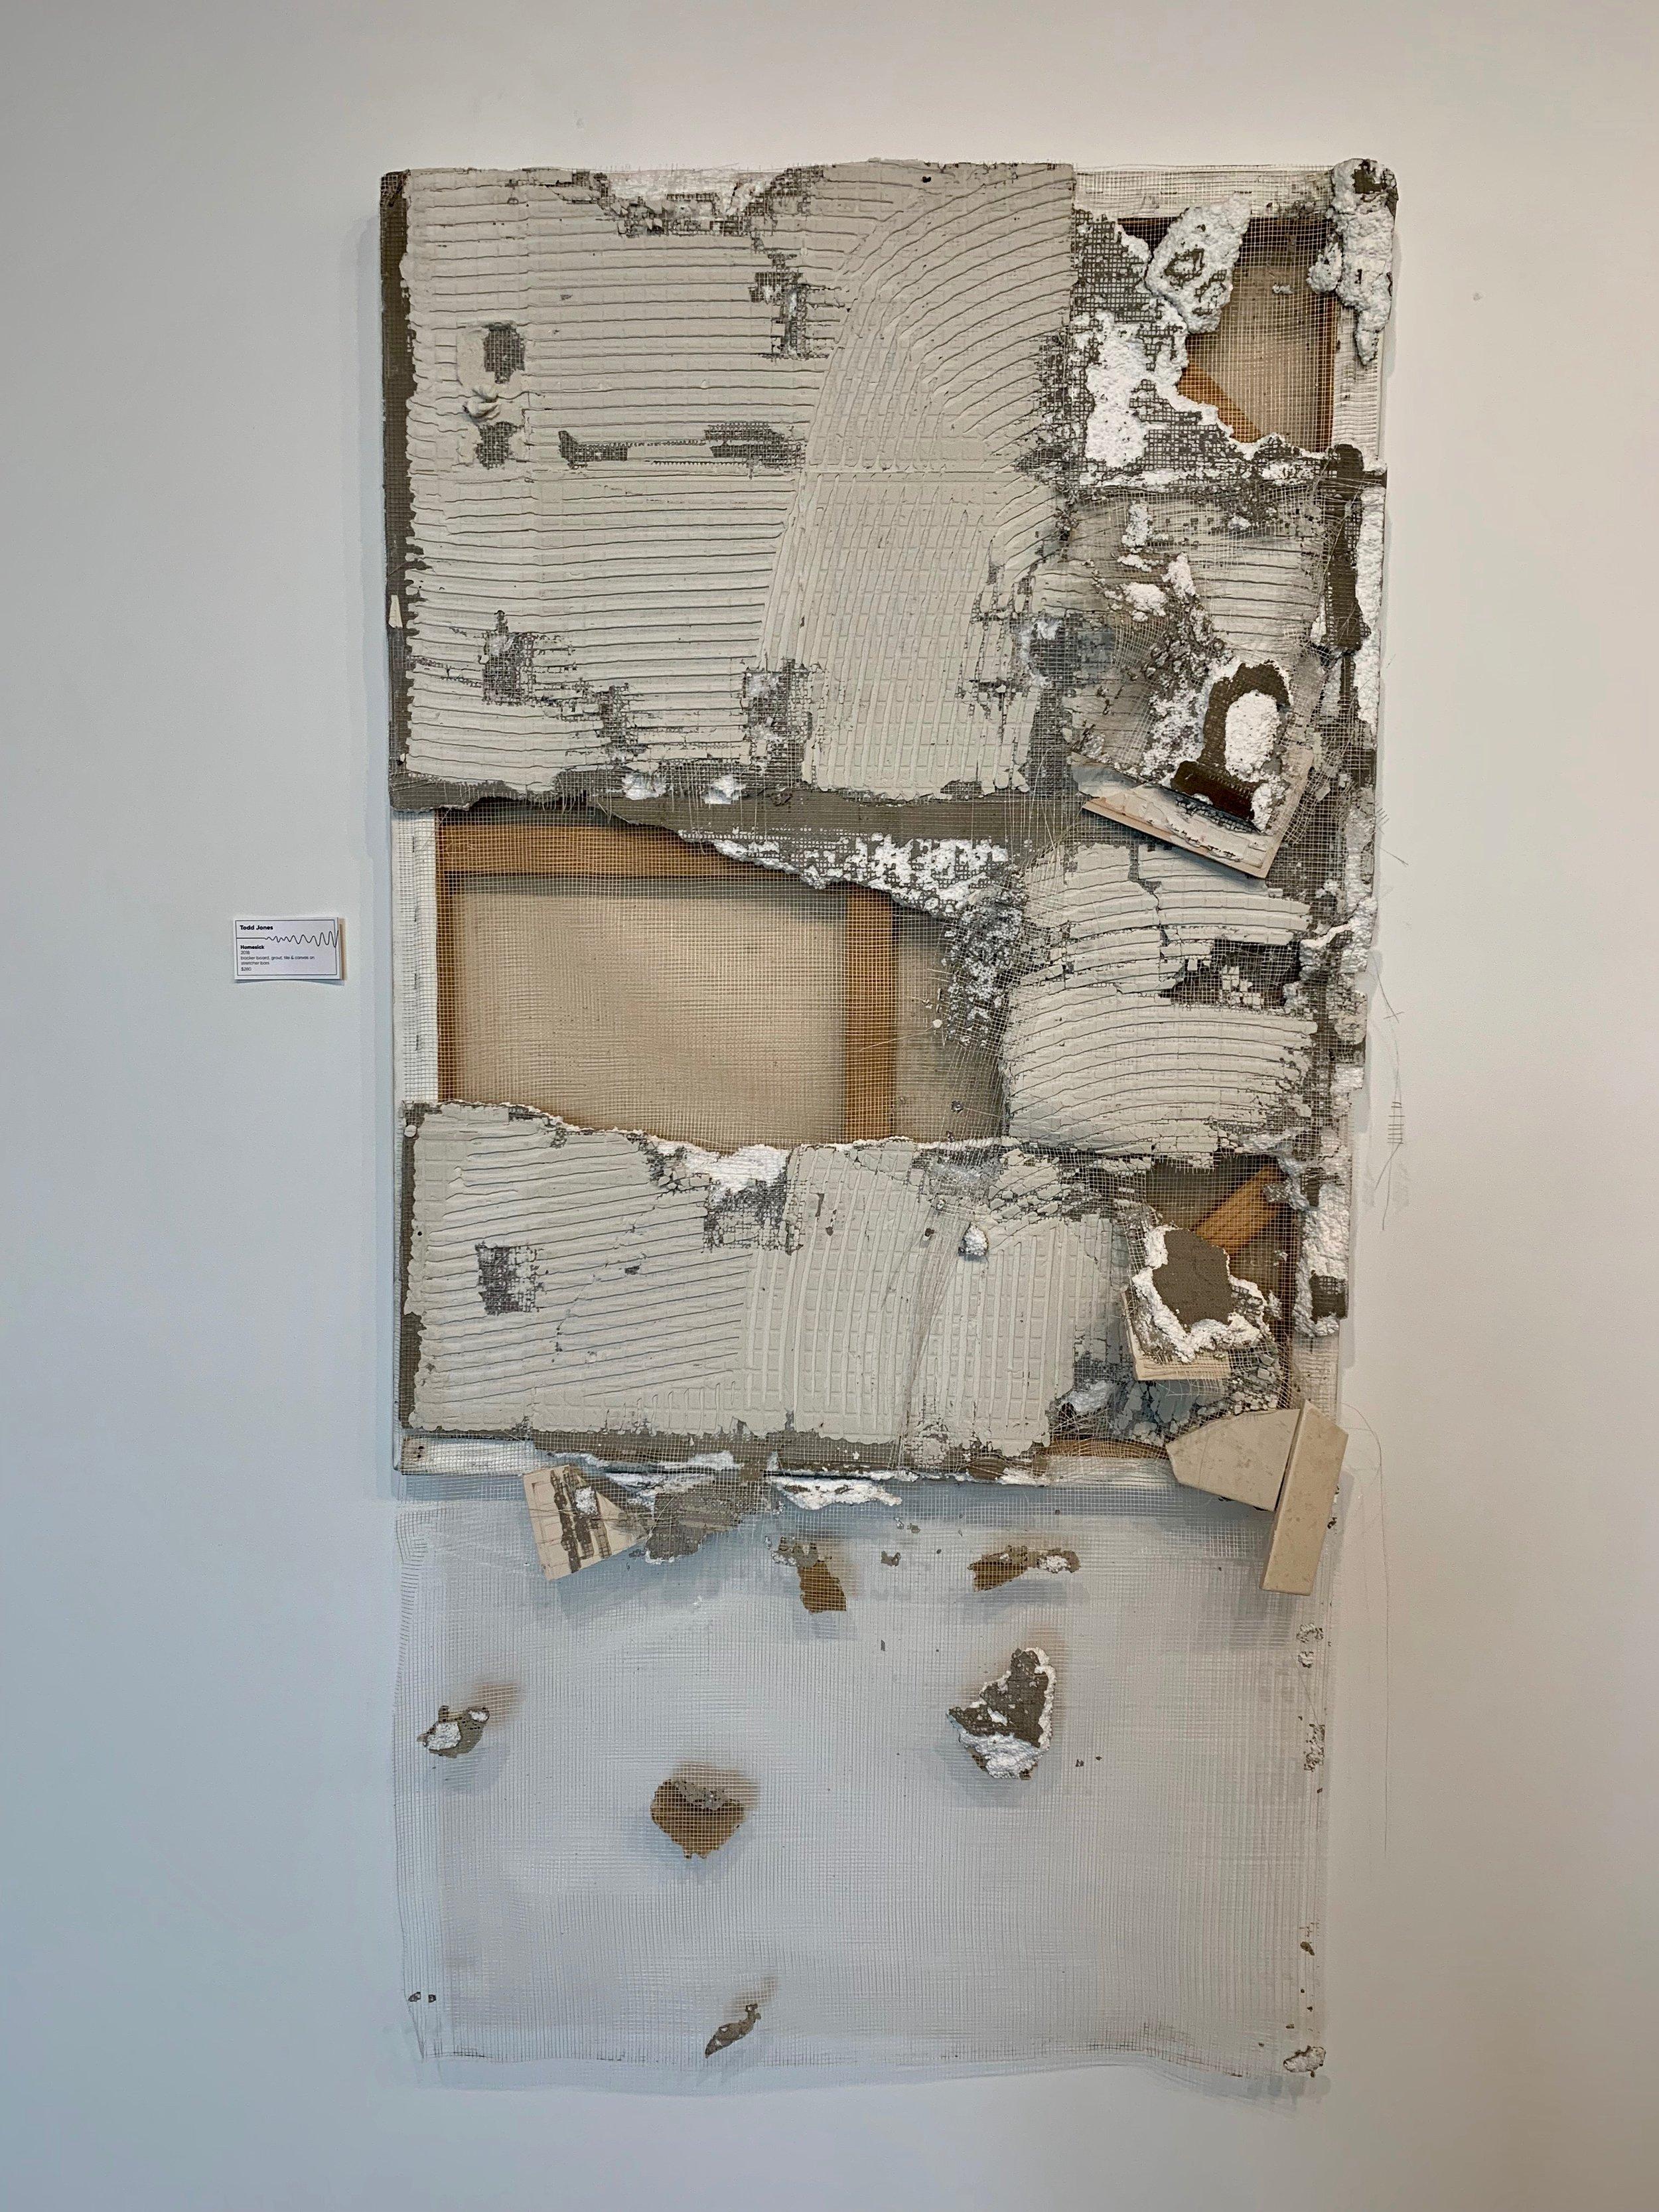 Todd Jones,  Homesick , 2018, backer board, grout, tile & canvas on stretcher bars